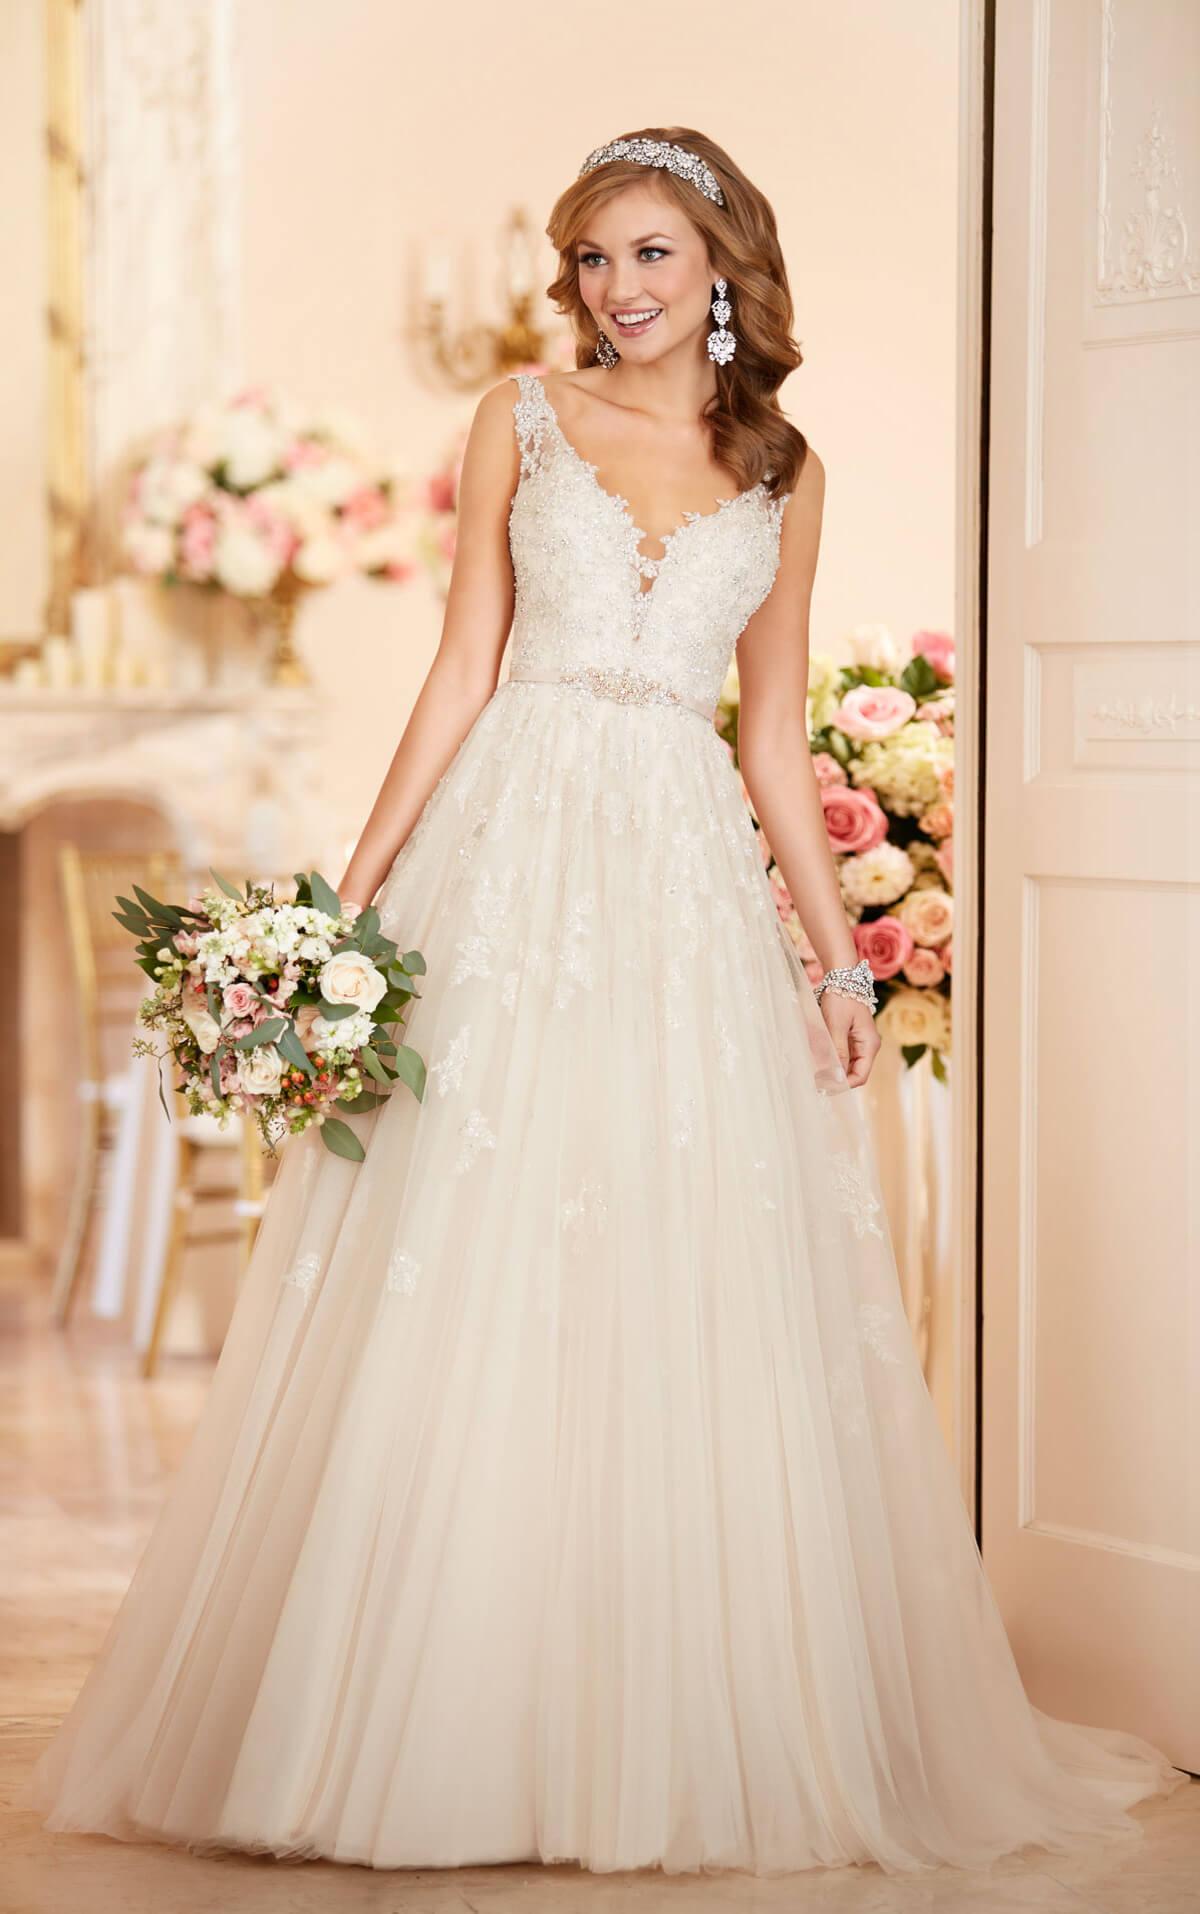 wedding dresses aline lace aline wedding dress Tulle A Line Wedding Dress